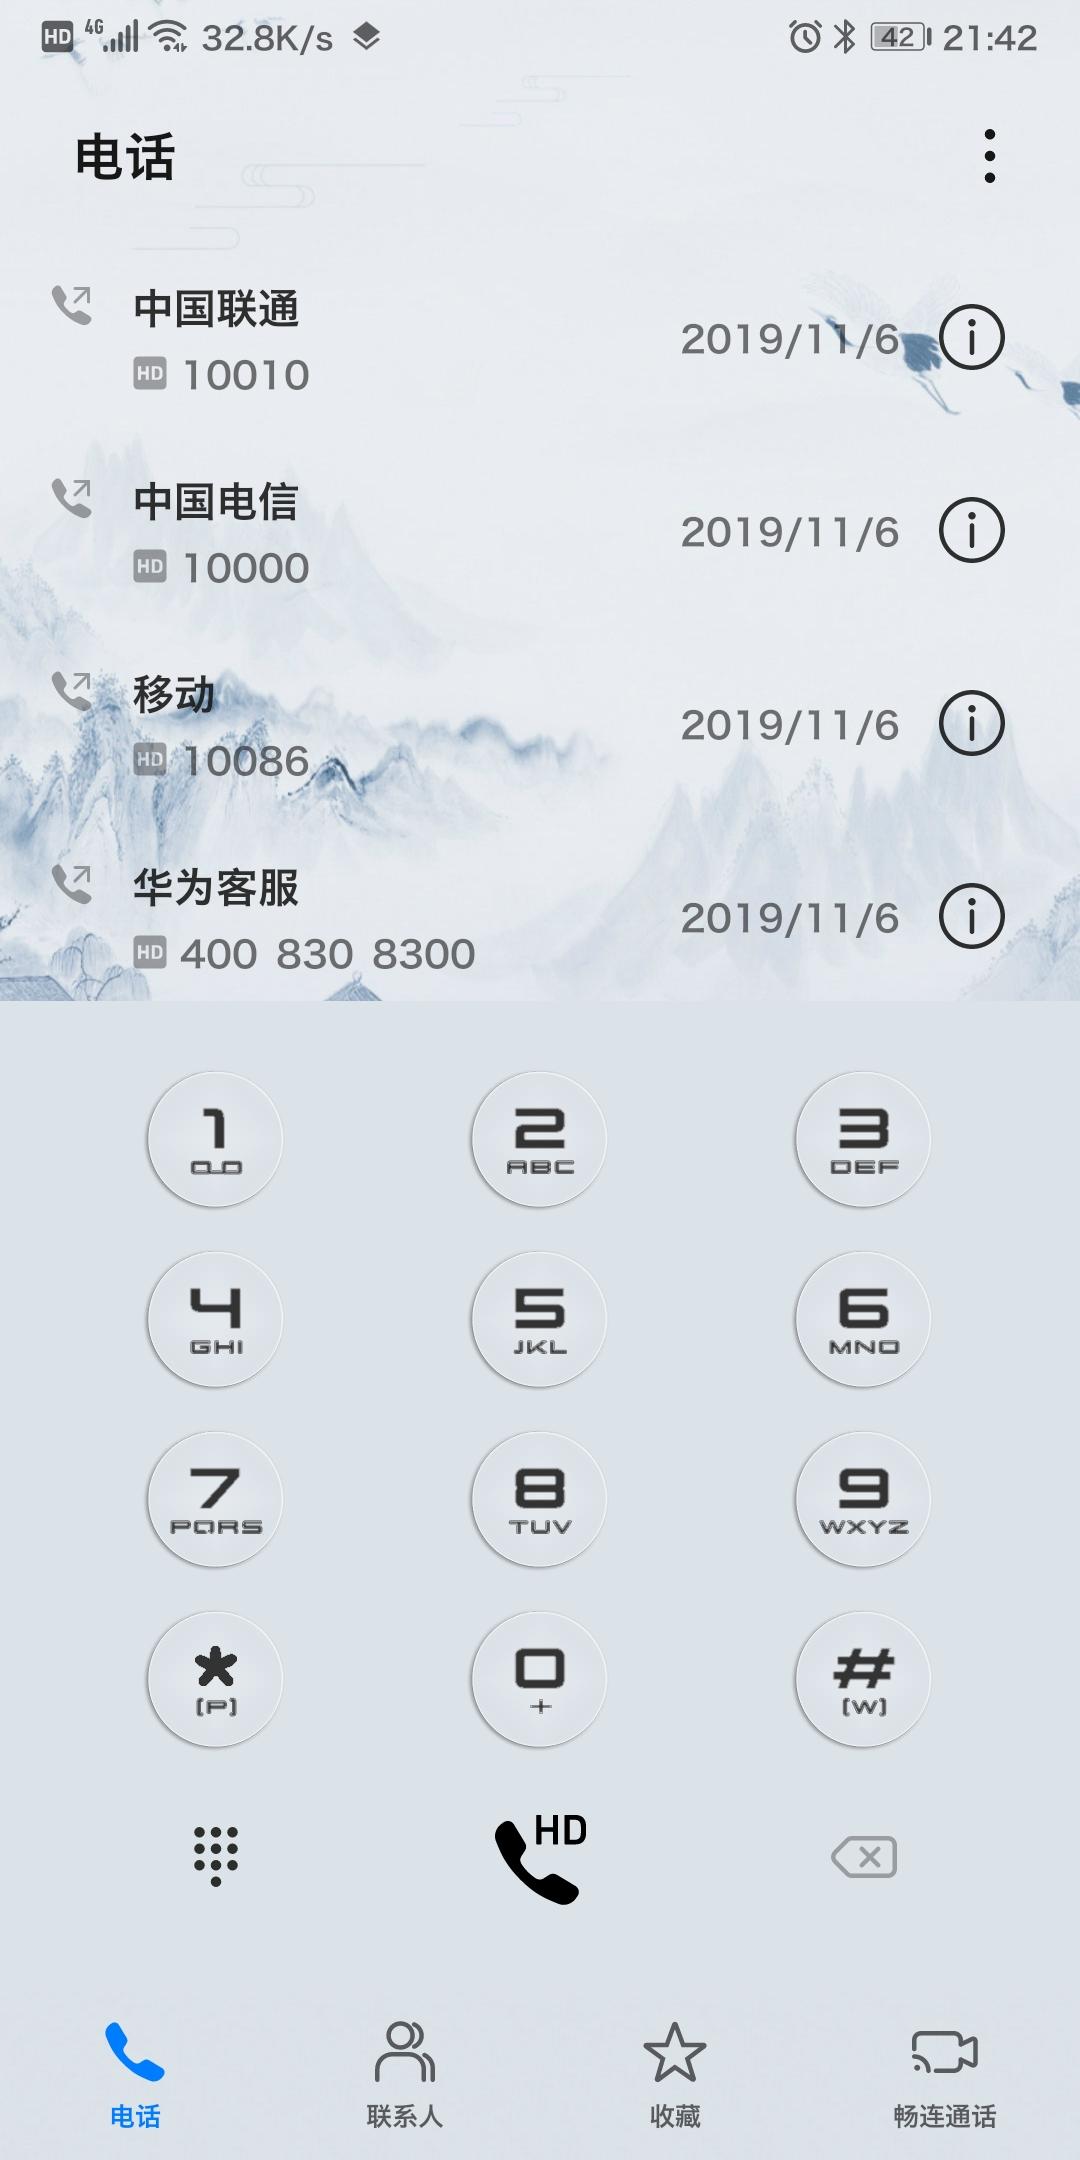 Screenshot_20200107_214258_com.android.contacts.jpg